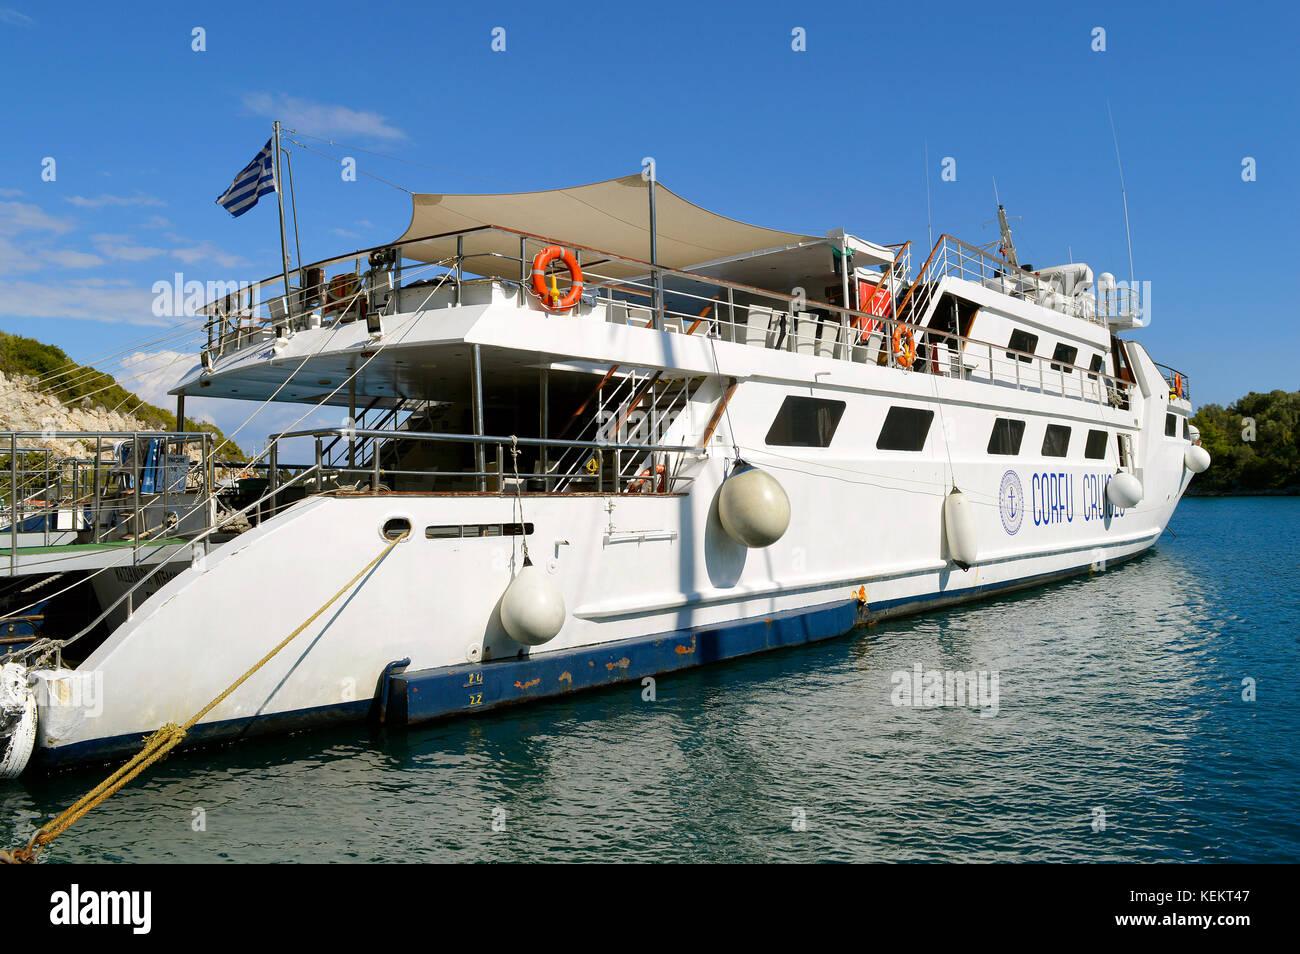 Corfu cruises ferry in Antipaxos harbour ready to sail to Corfu - Stock Image